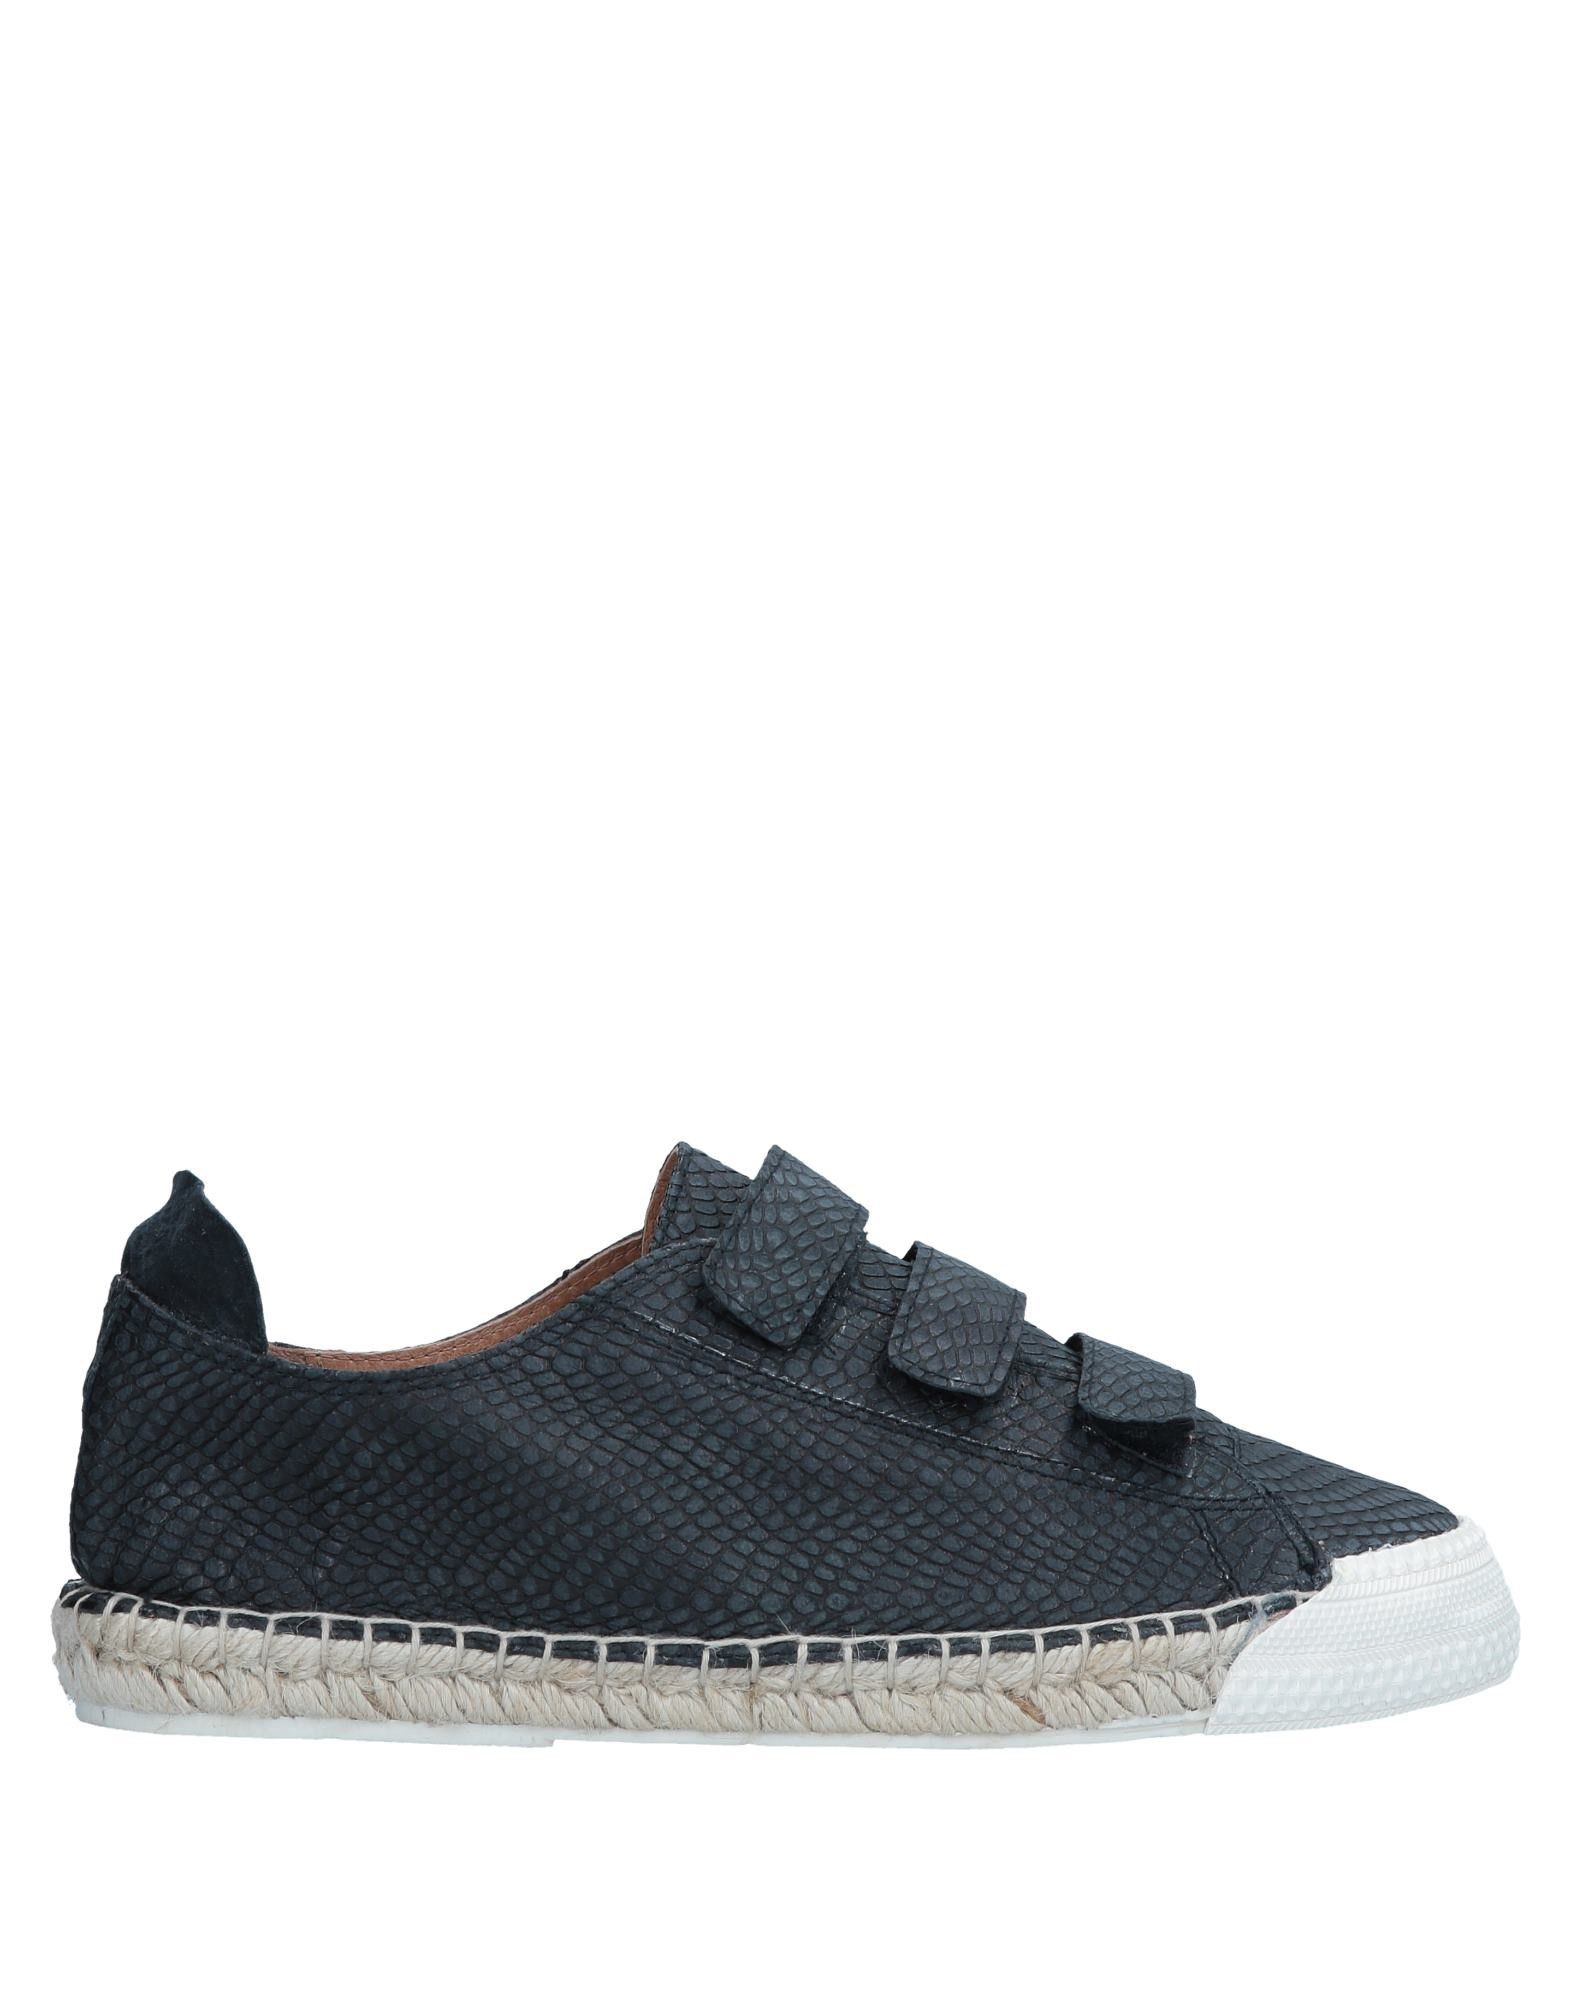 M&P Maypol Sneakers Damen  11546035MA Gute Qualität beliebte beliebte beliebte Schuhe 5b8638